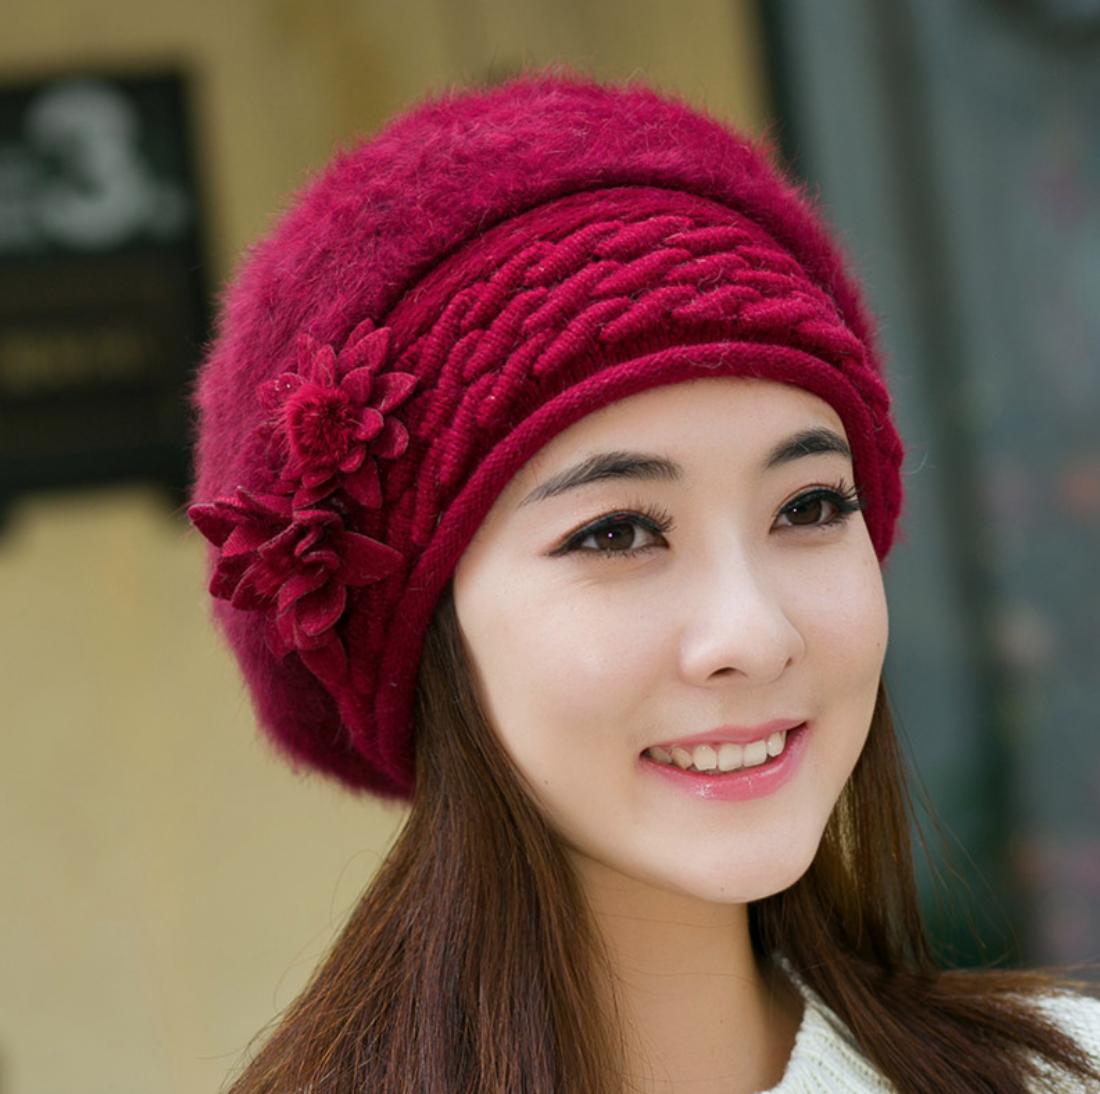 Flower Ornate Knit Hat